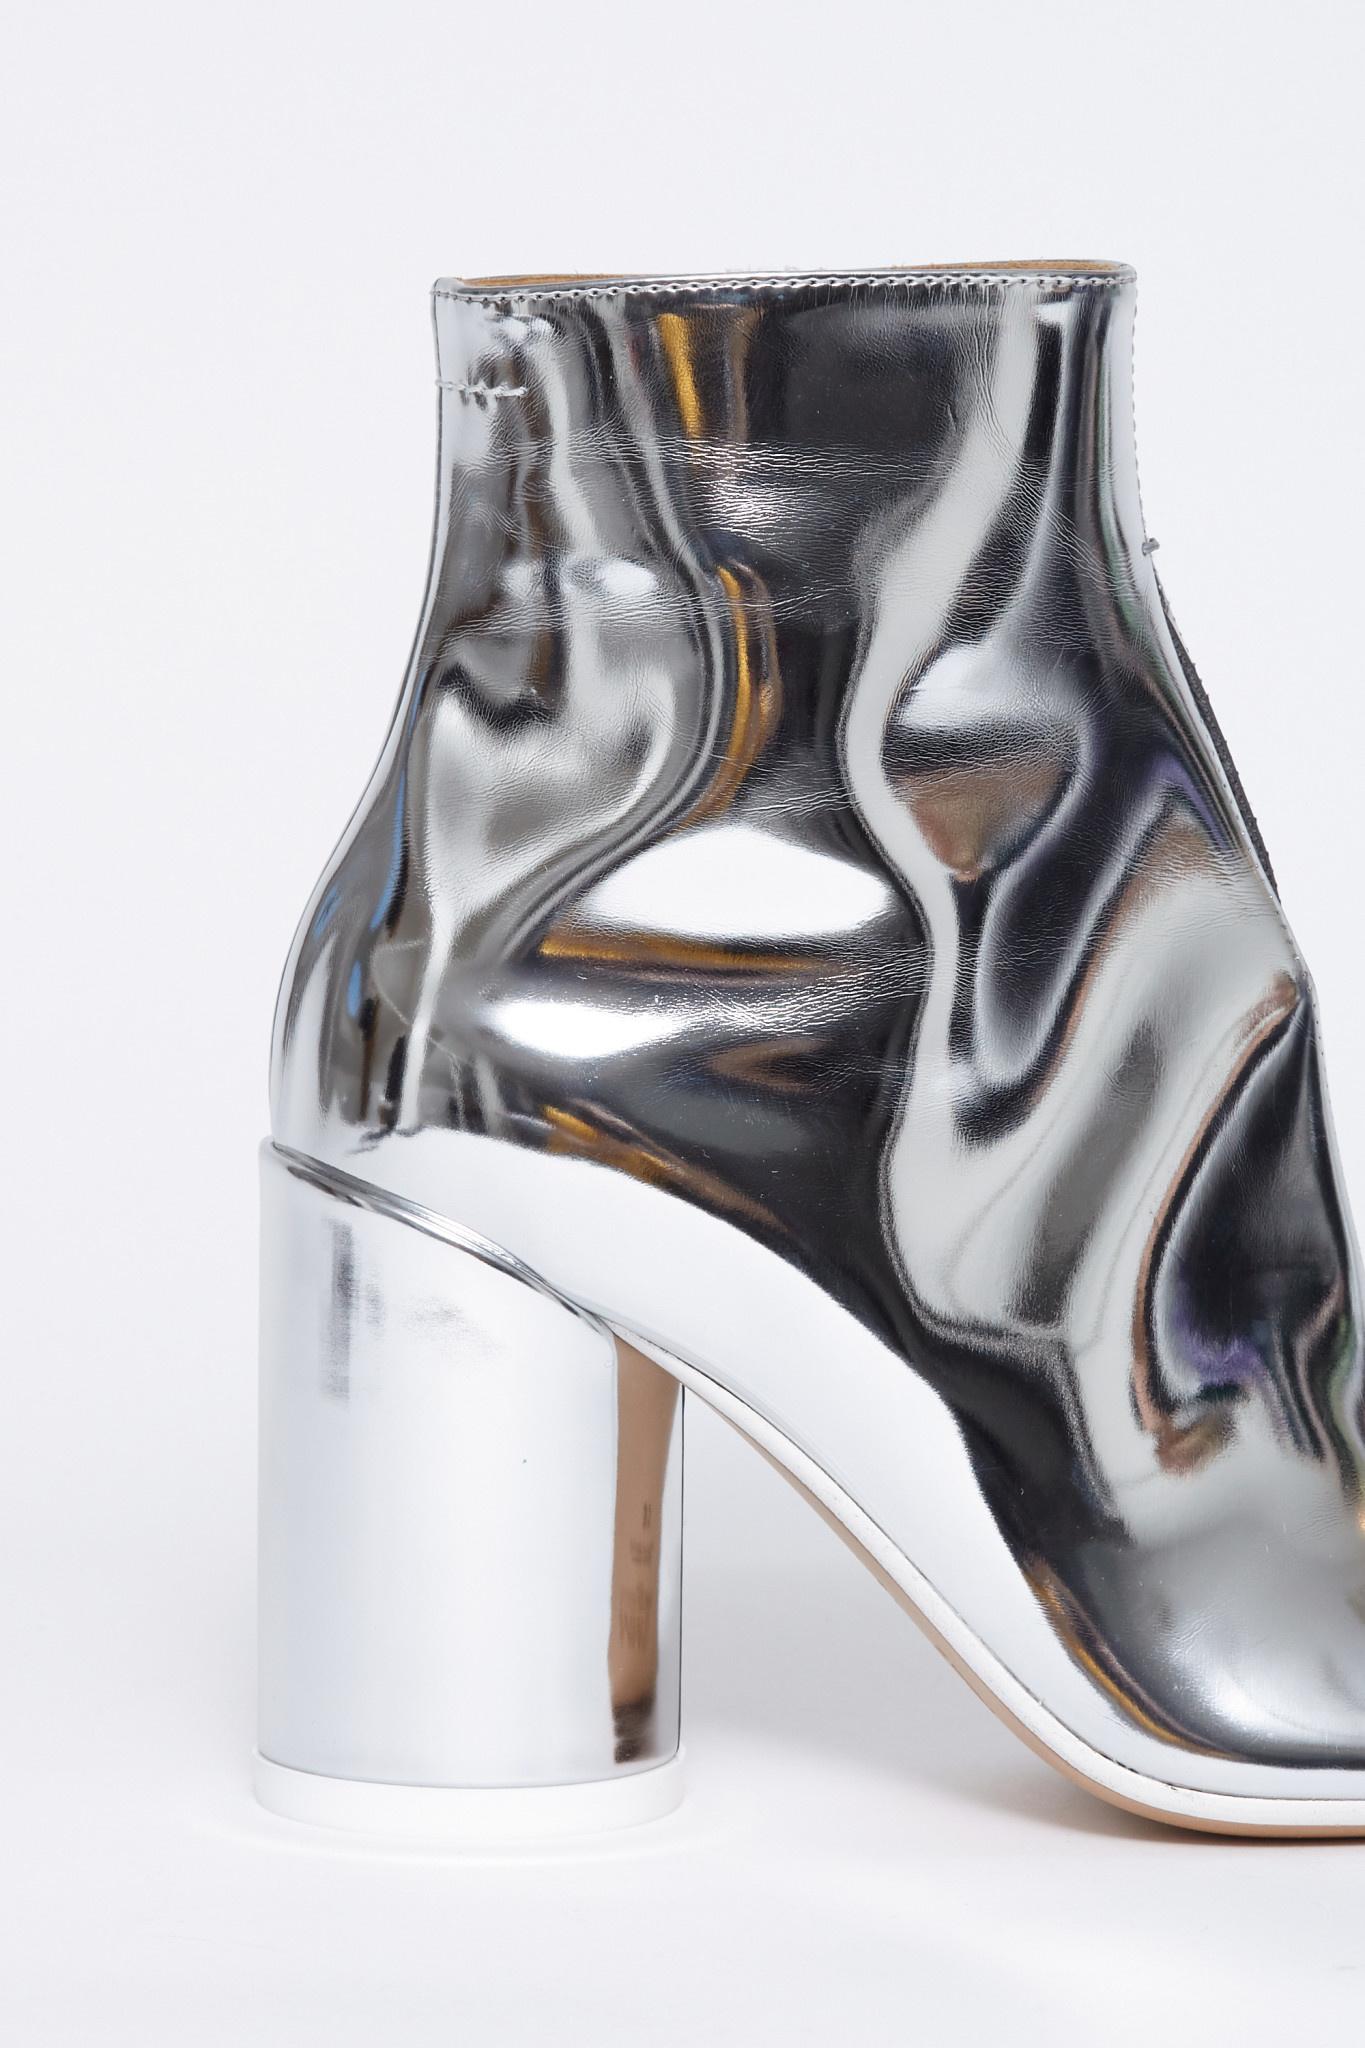 MM6 MAISON MARGIELA MM6 MAISON MARGIELA Split front Ankle boot in Mirror Silver